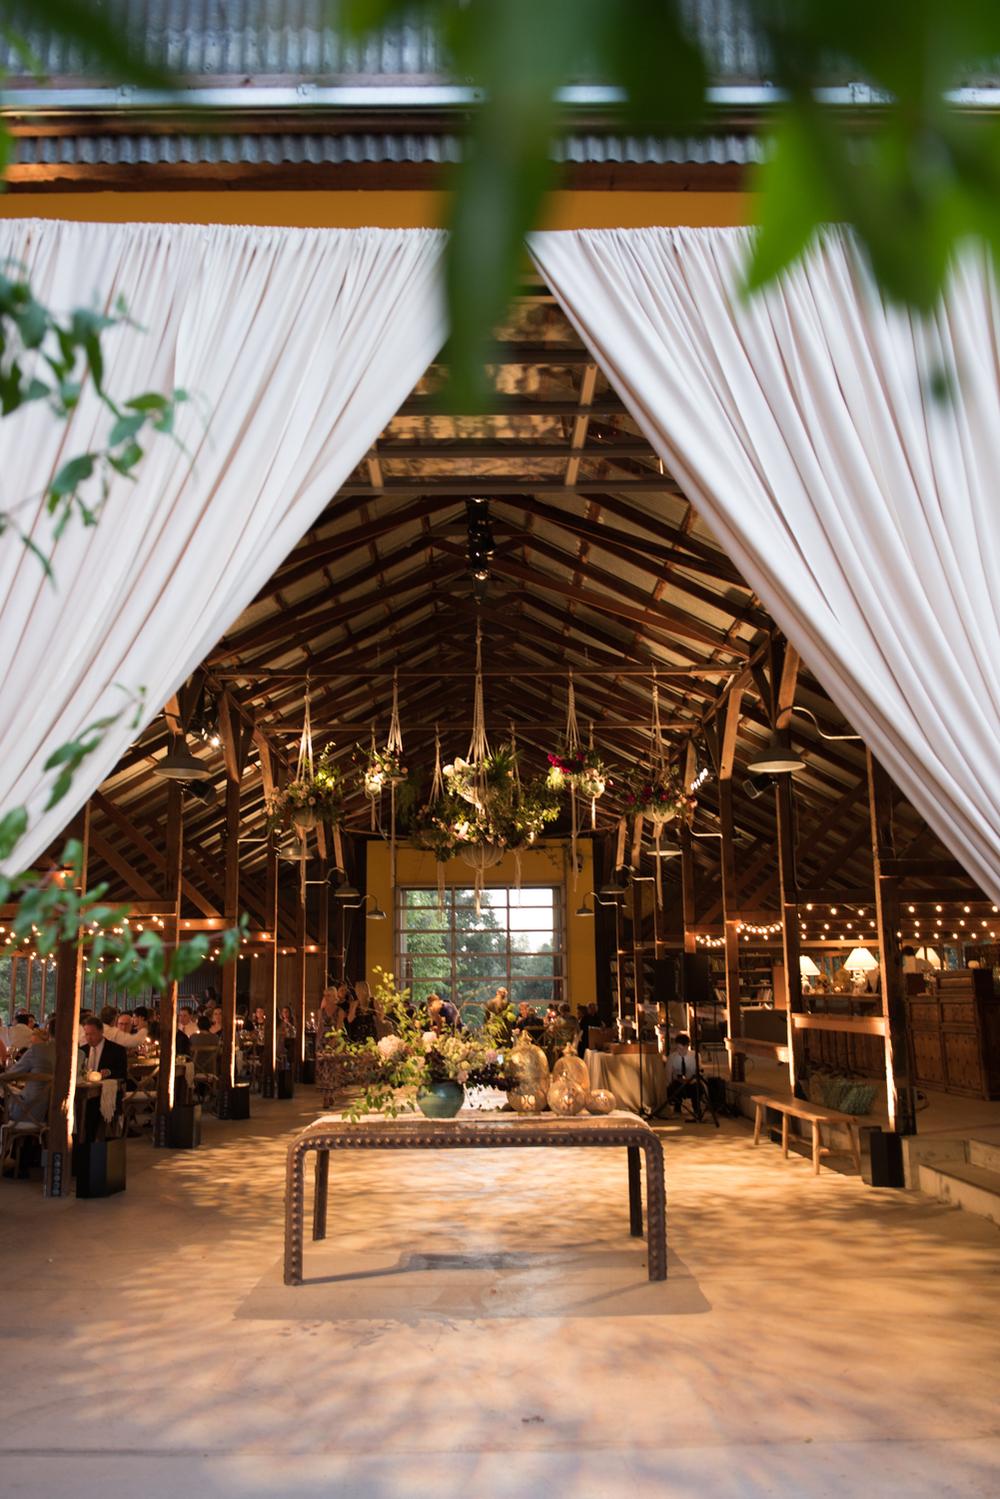 Sylvie-Gil-film-destination-photography-bohemian-colorful-macrame-Napa-wedding-barn-reception-evening.jpg